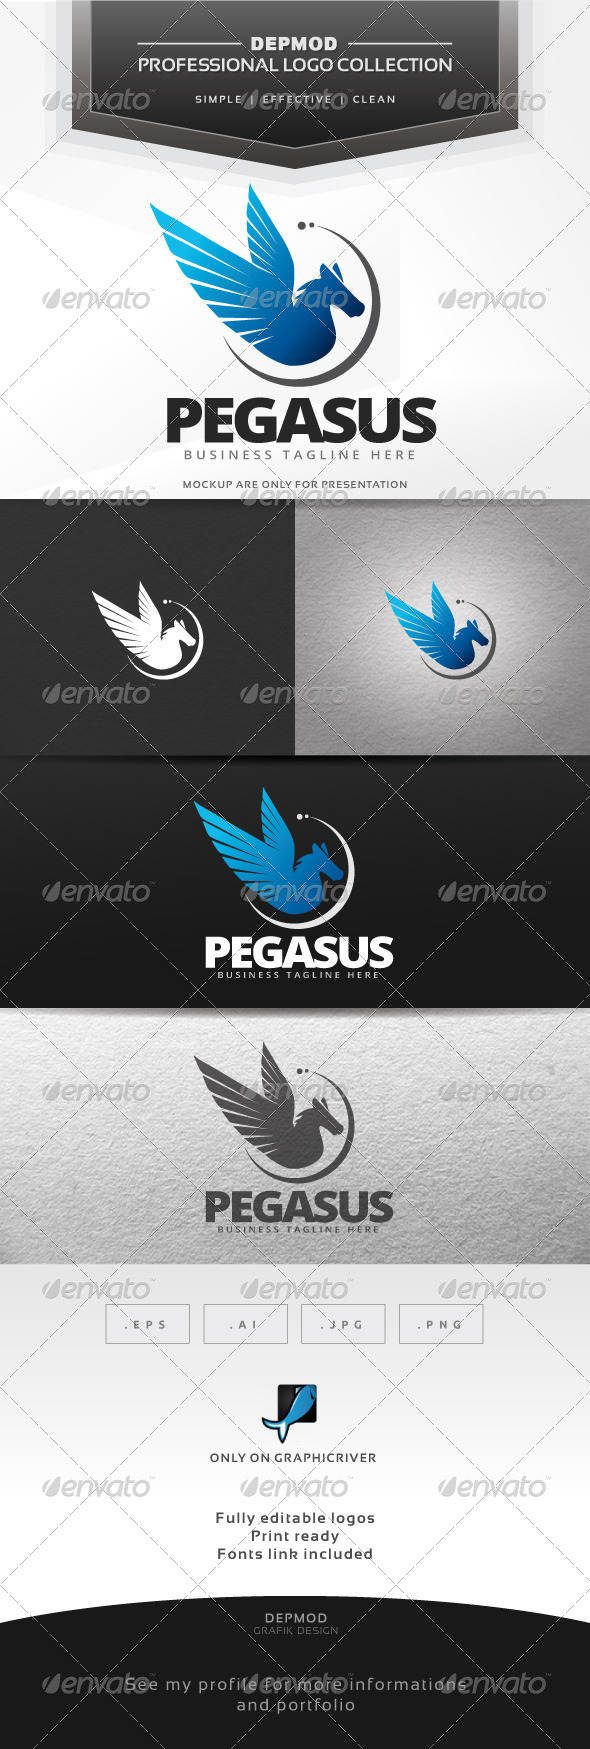 GraphicRiver Pegasus Logo 7650836